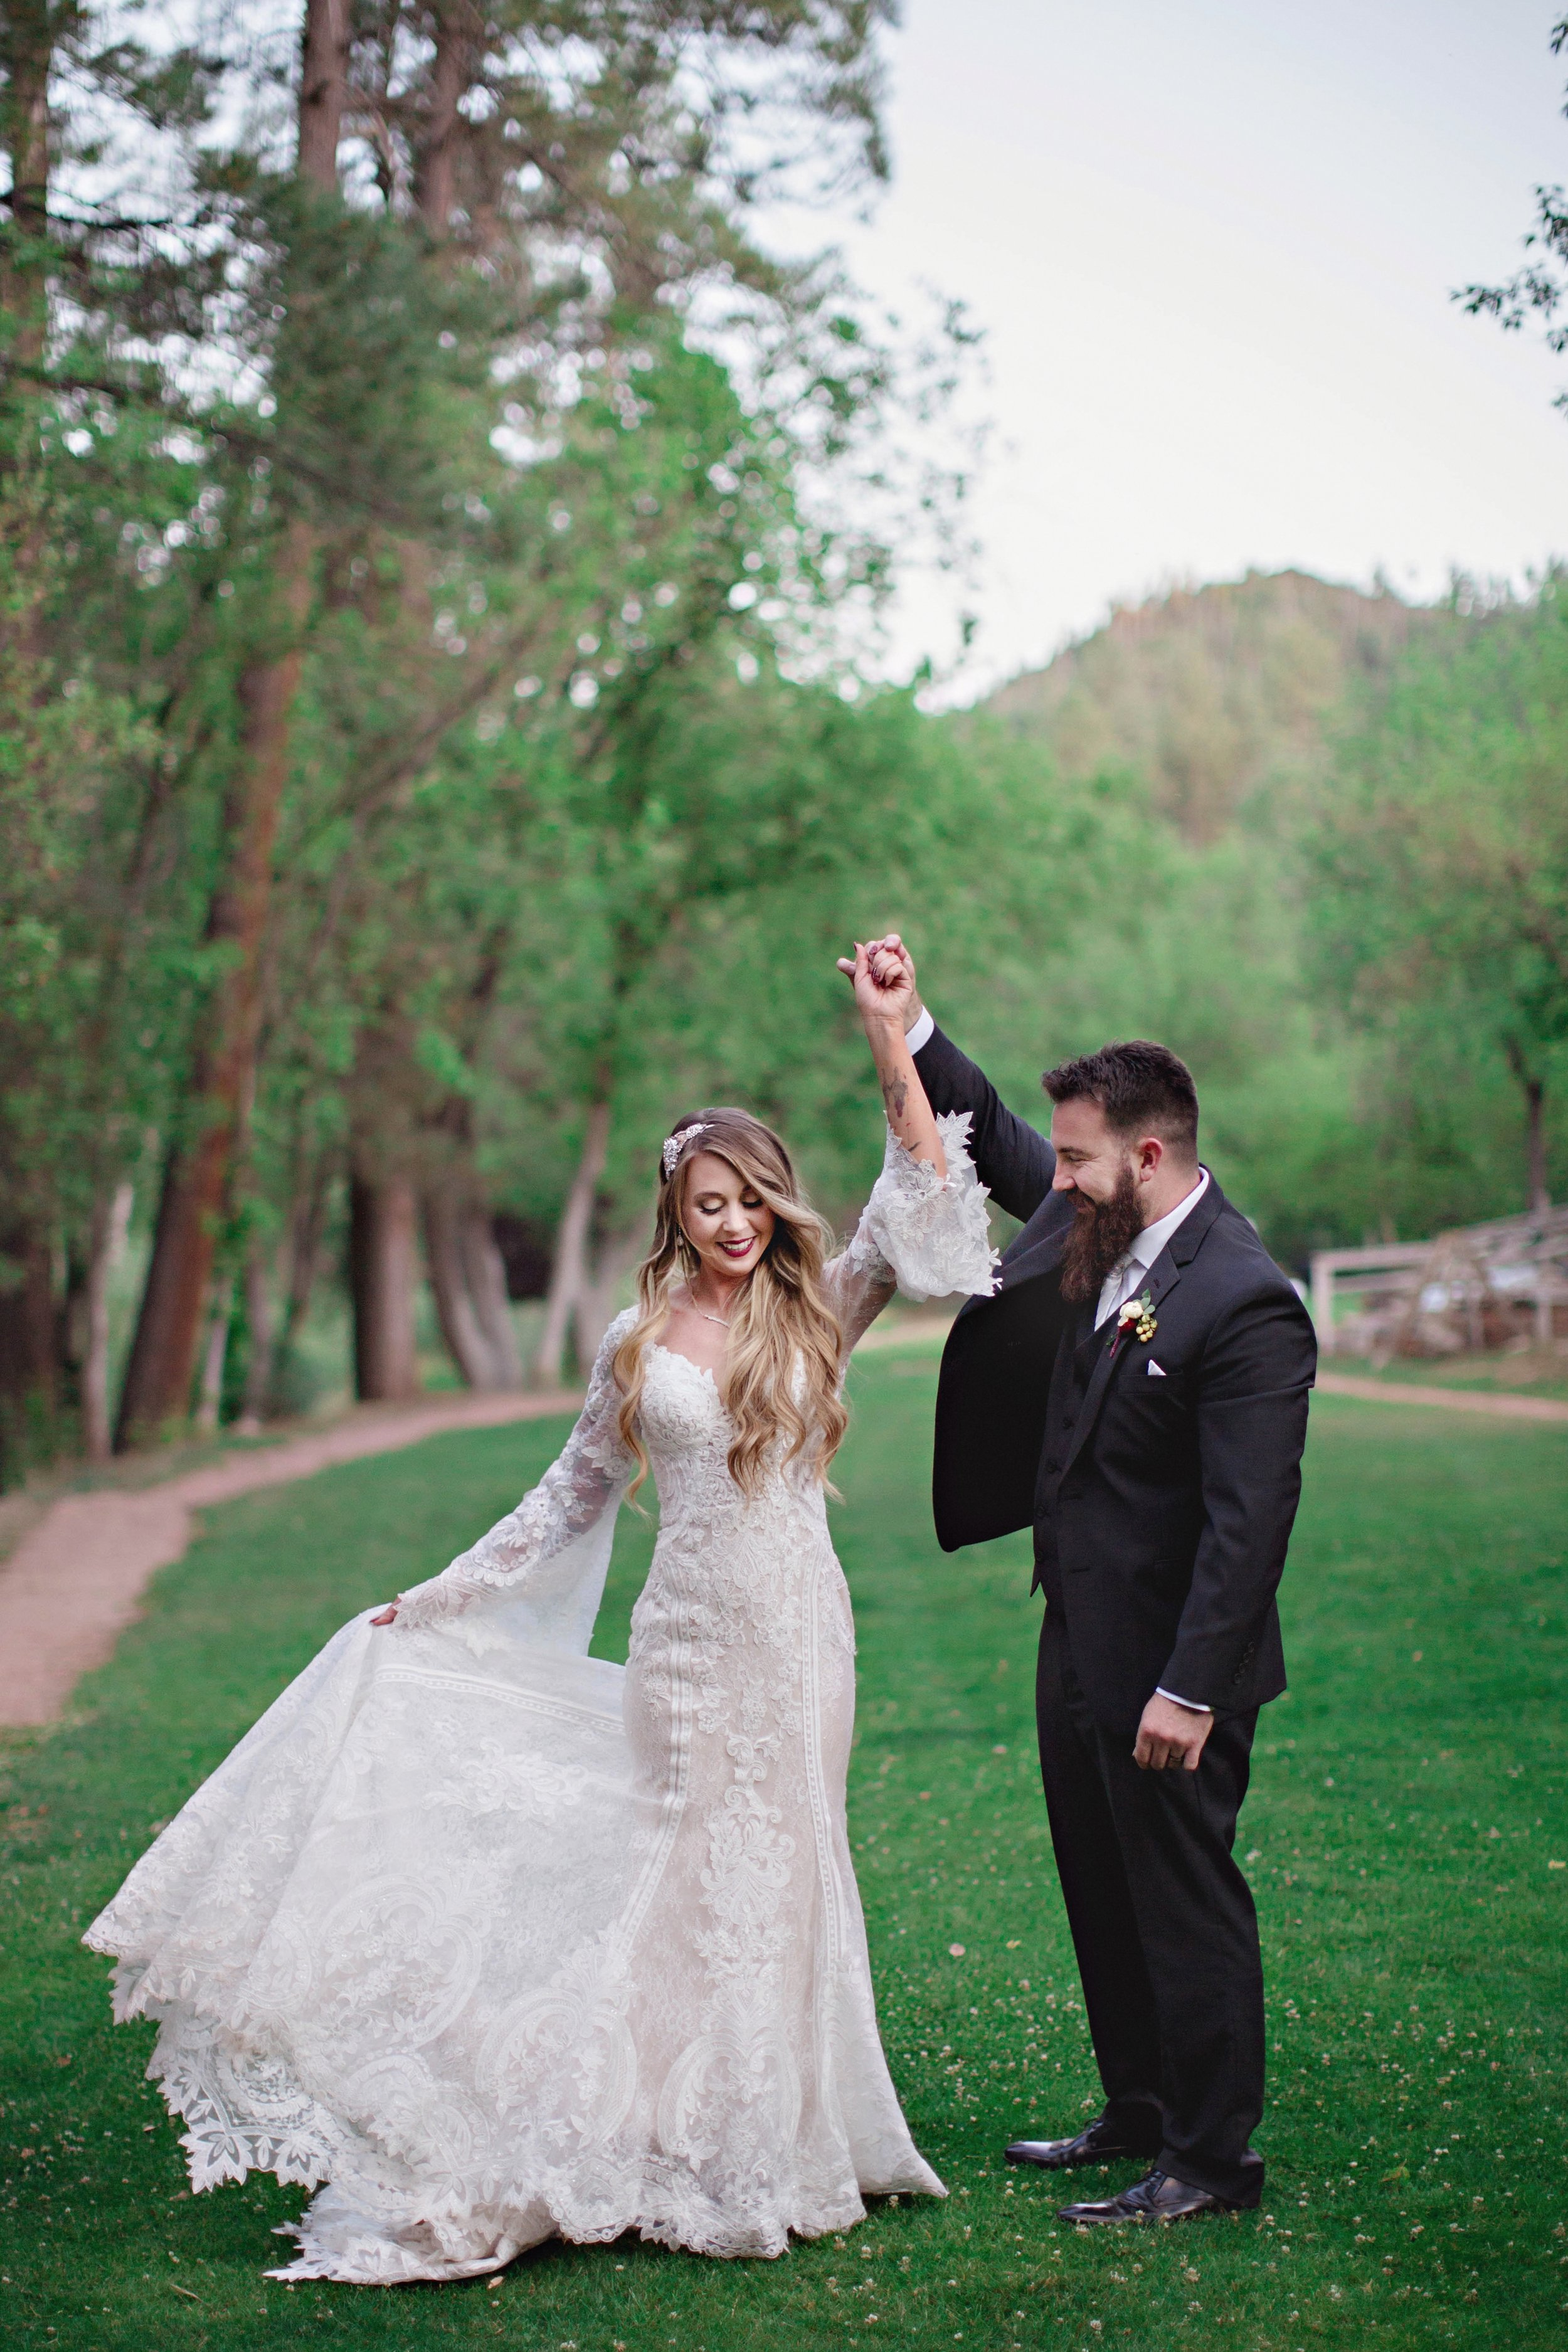 weddings-payson-18.jpg